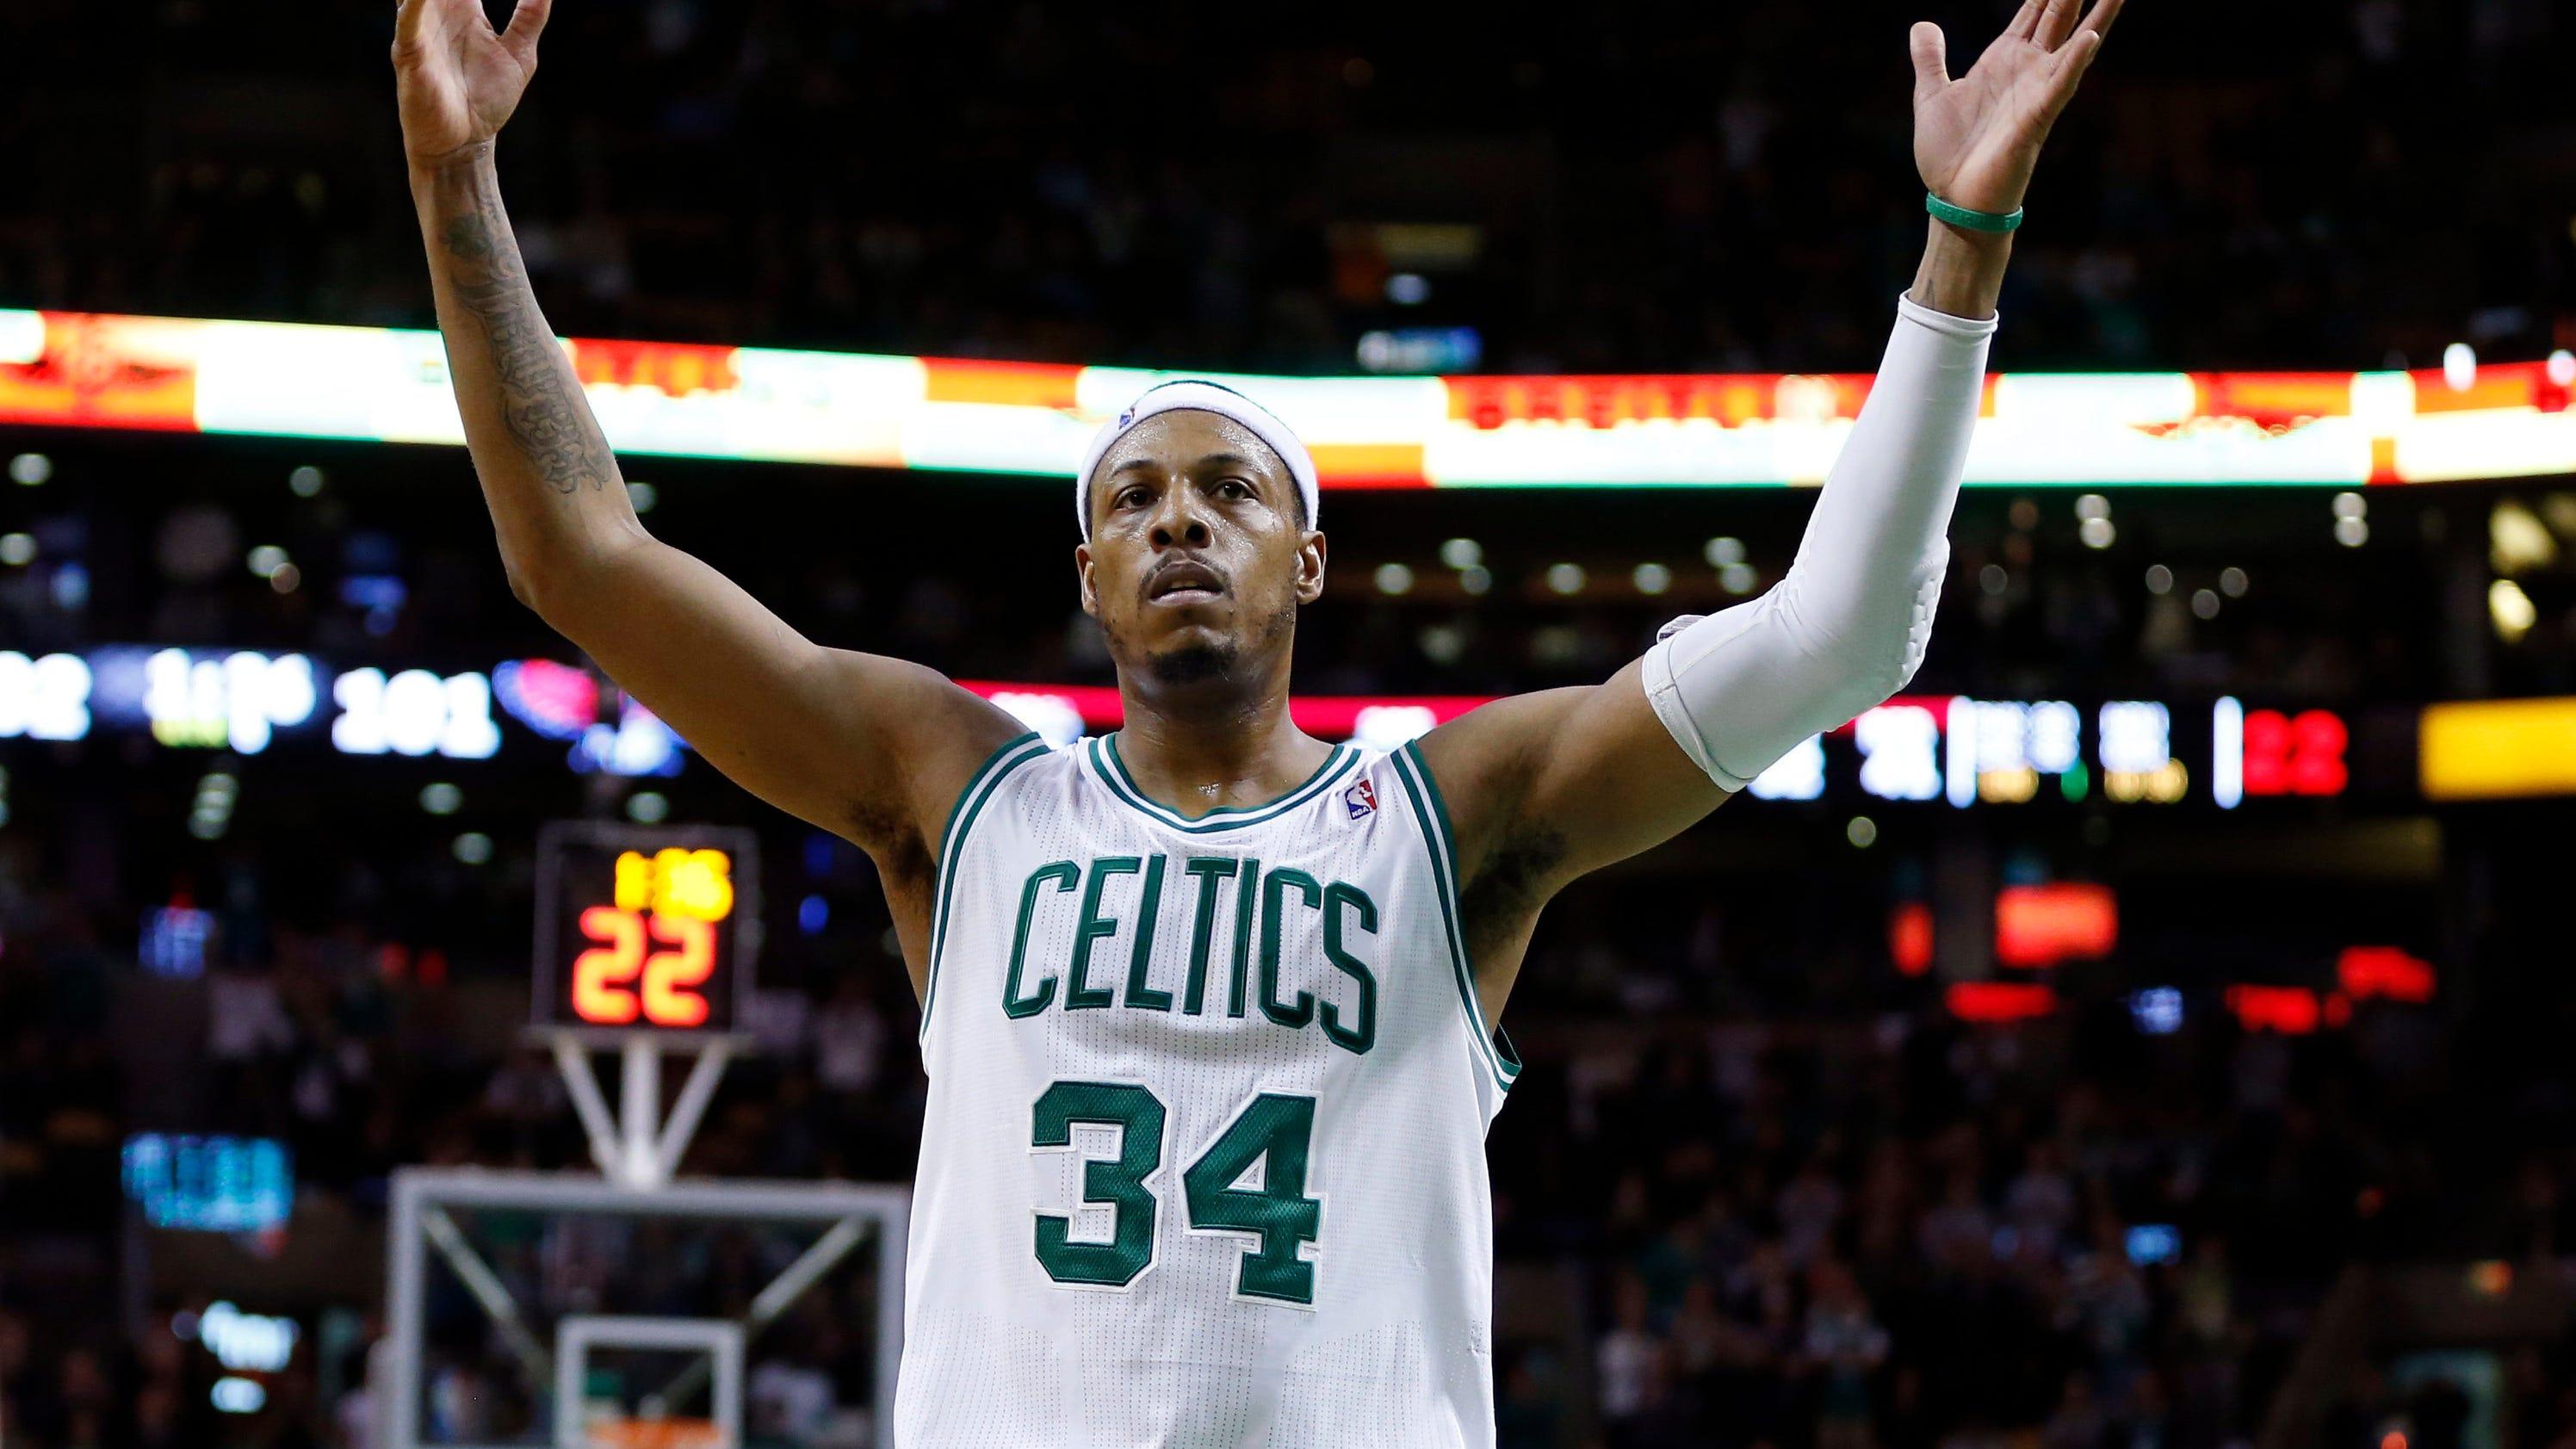 Ap_celtics_pierce_number_basketball_93144631